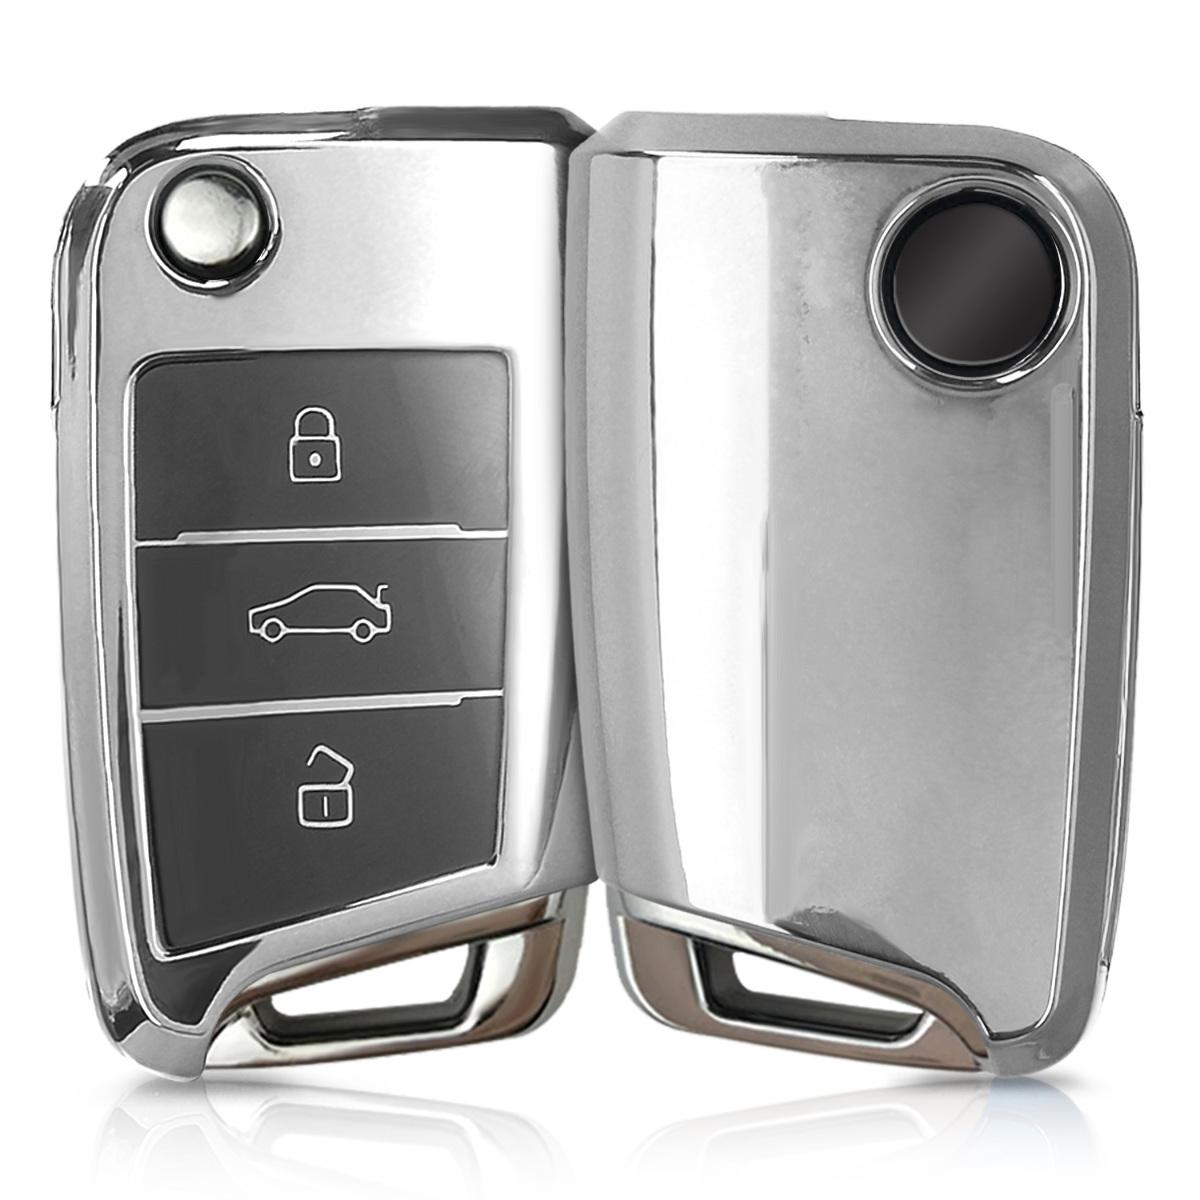 KW Θήκη Κλειδιού VW Golf 7 MK7 - Σιλικόνη -  3 Κουμπιά - Silver High Gloss (48037.94)